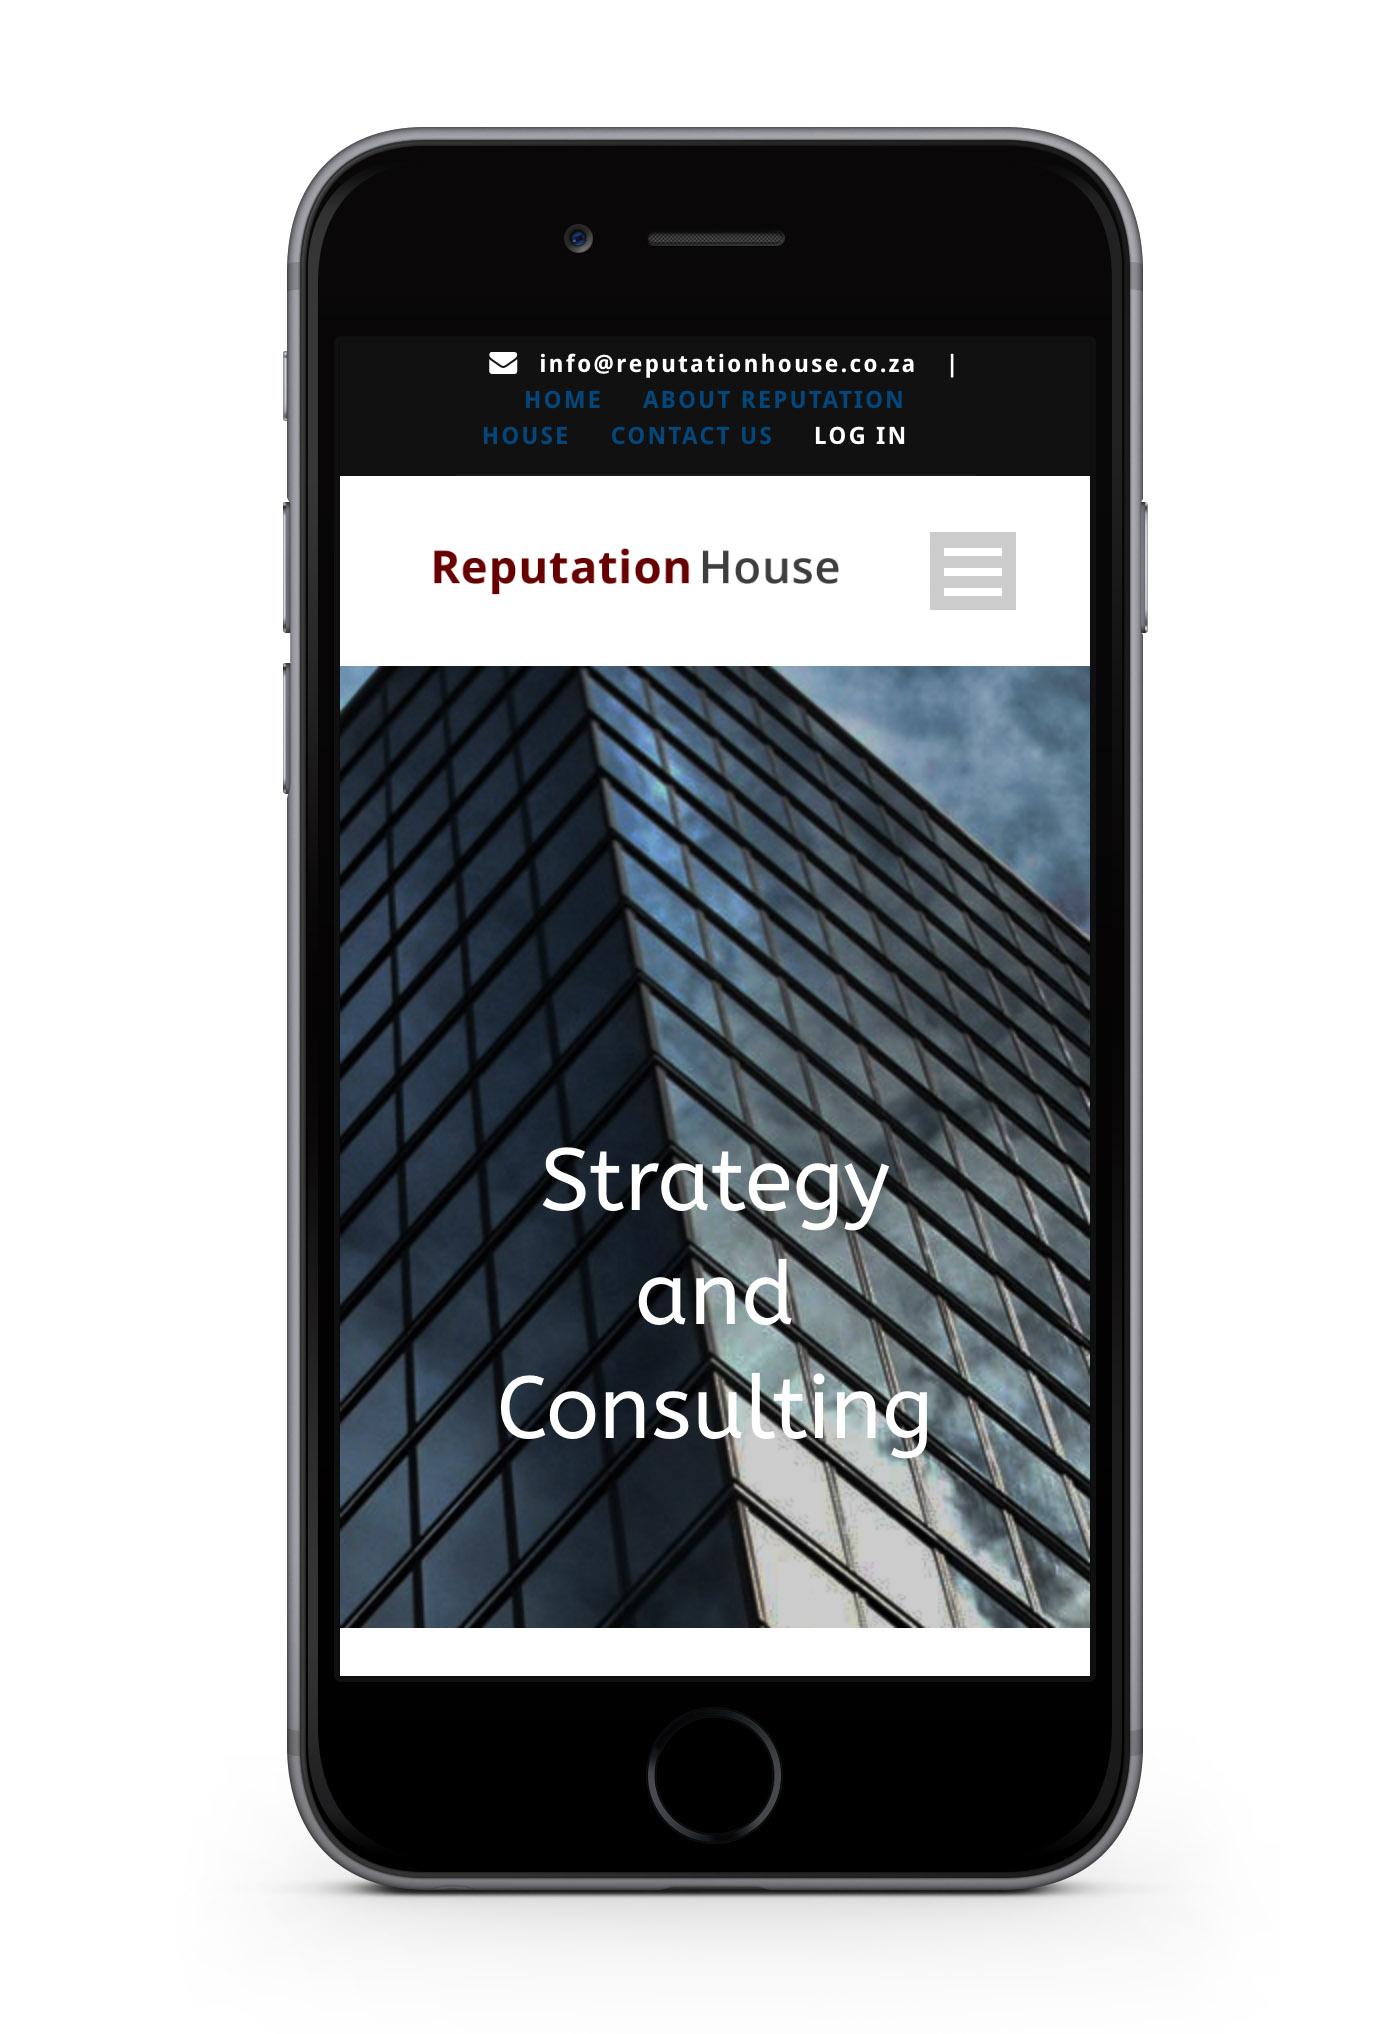 reputation house web-design-portfolio-webdoor-responsive-web-design-agency-hillcrest-kwazulu-natal-phone